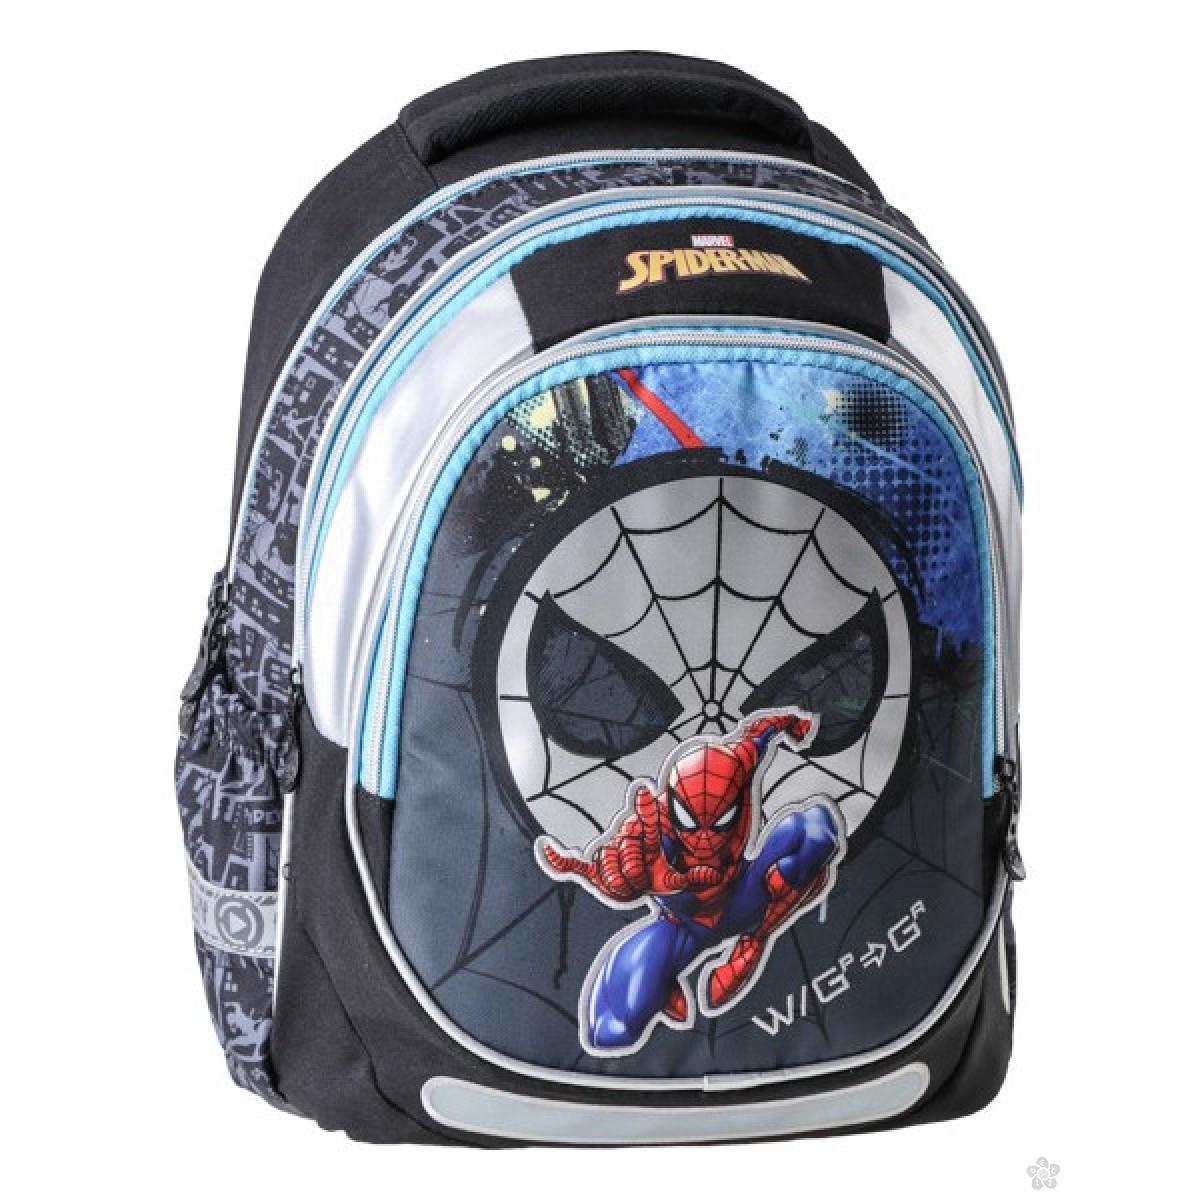 Anatomski ranac Maxx Spiderman 326021